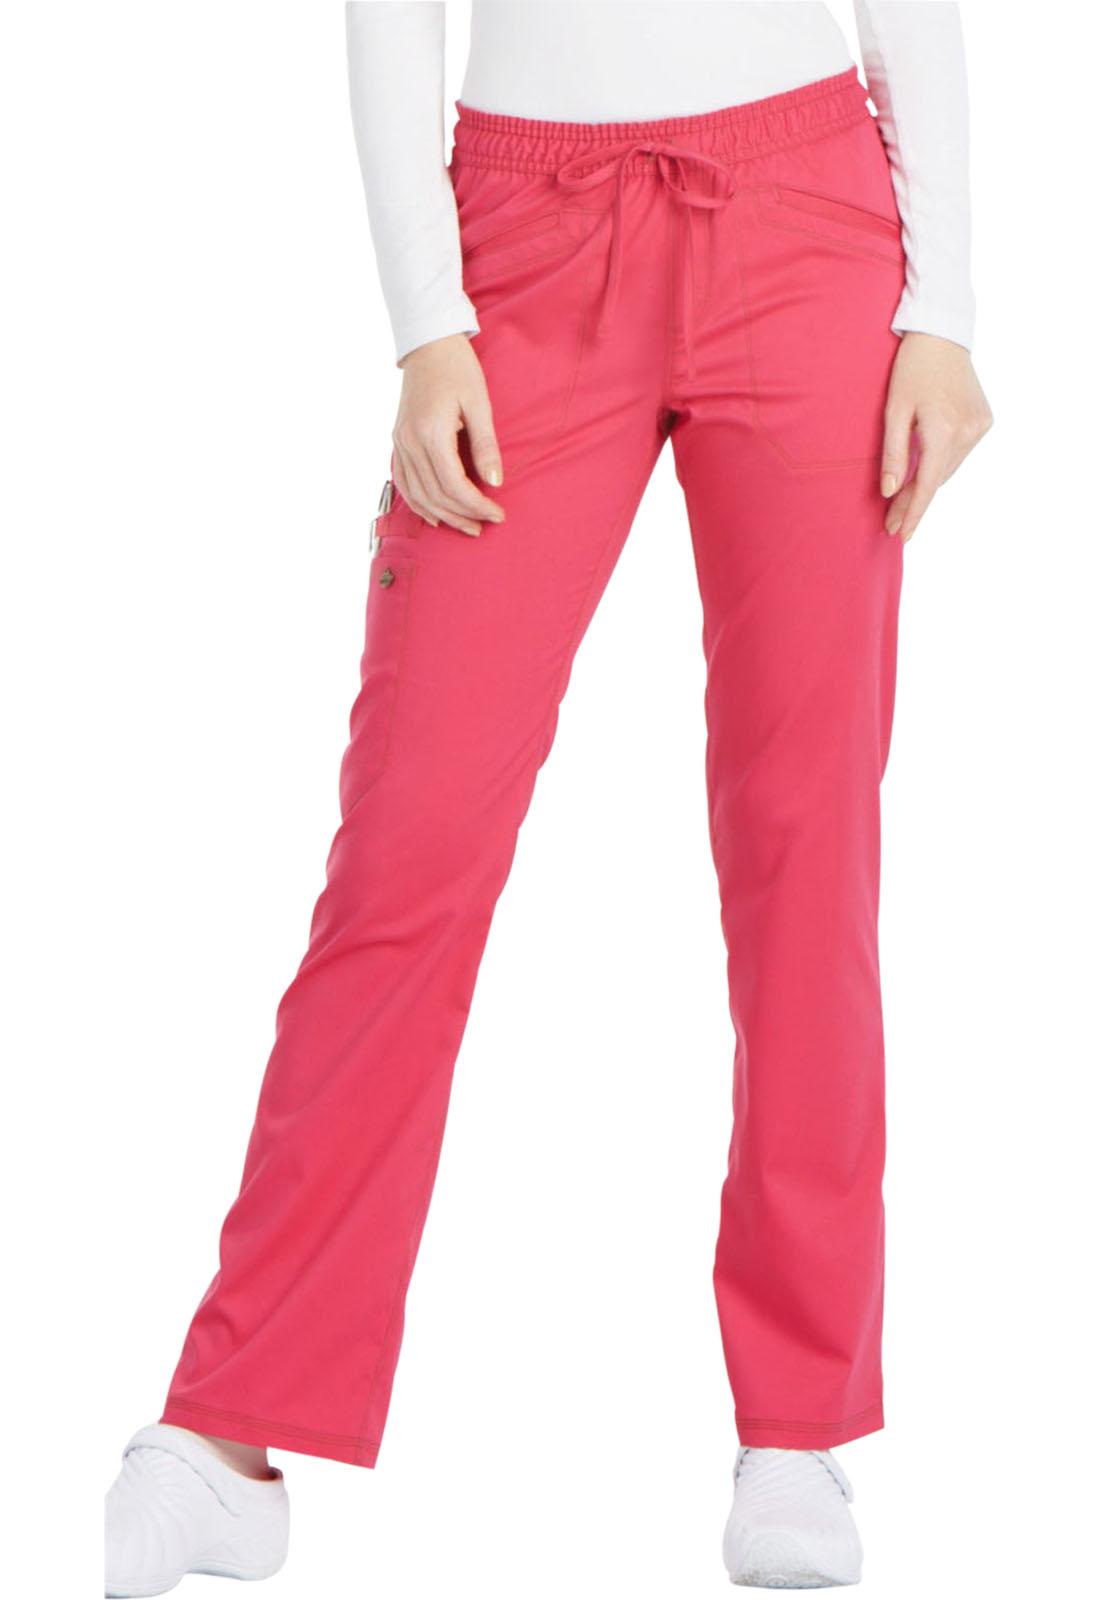 c0292563767 Essence Mid Rise Straight Leg Drawstring Pant in Hot Pink DK106-HPKZ ...